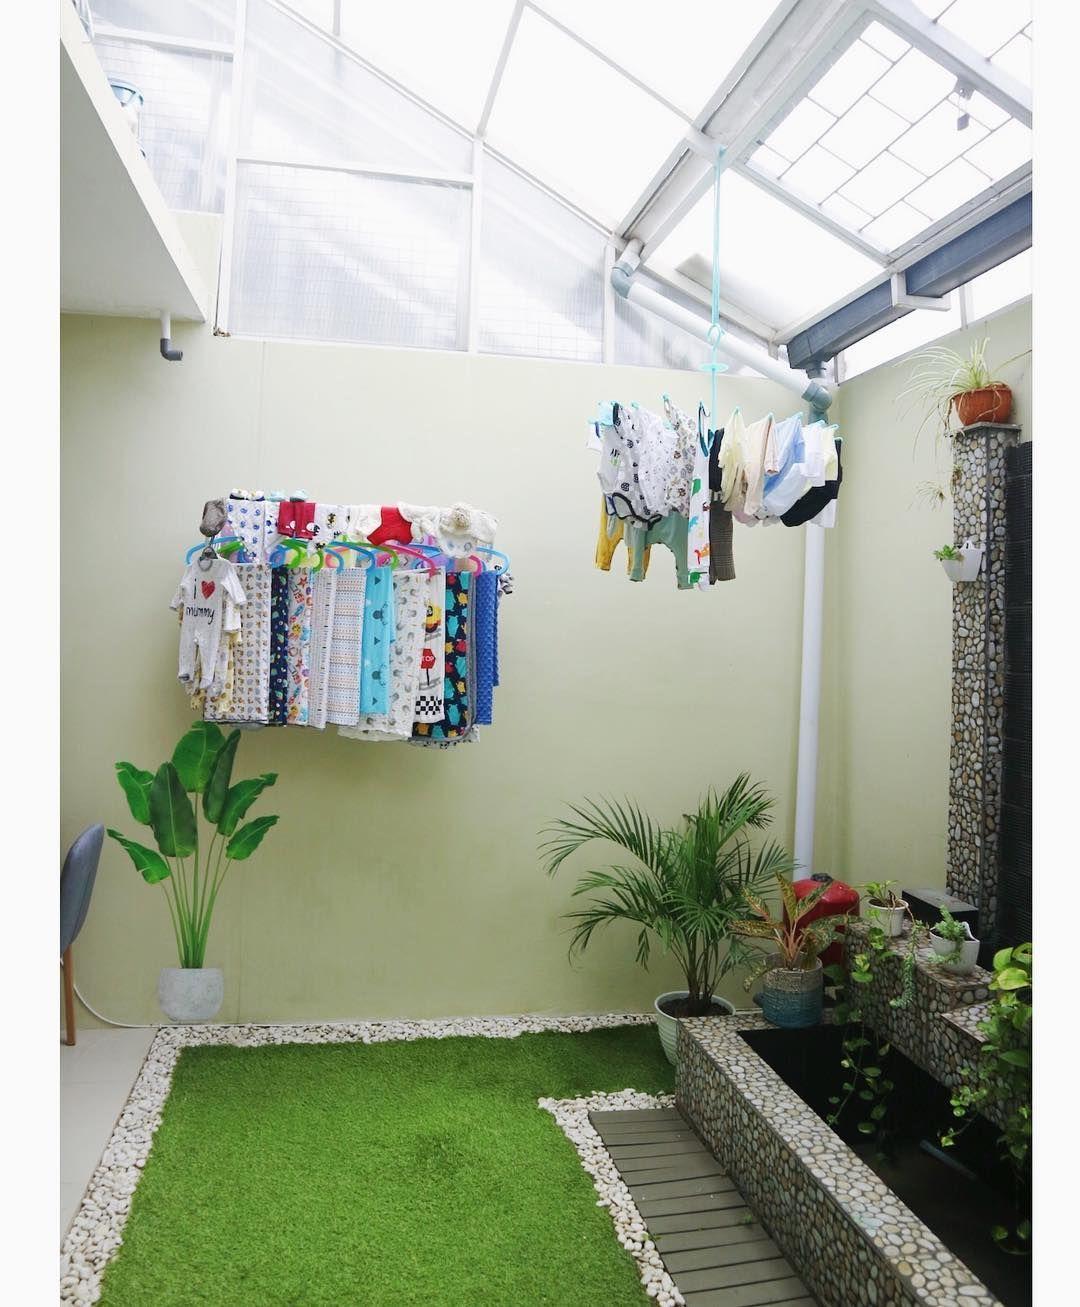 Hannibii On Instagram Nongkrongin Yg Beginian Aja Udah Happy Bgt Ibu Mah Makasiih Yaa Bapa Ud Home Room Design Laundry Room Design Home Decor Kitchen